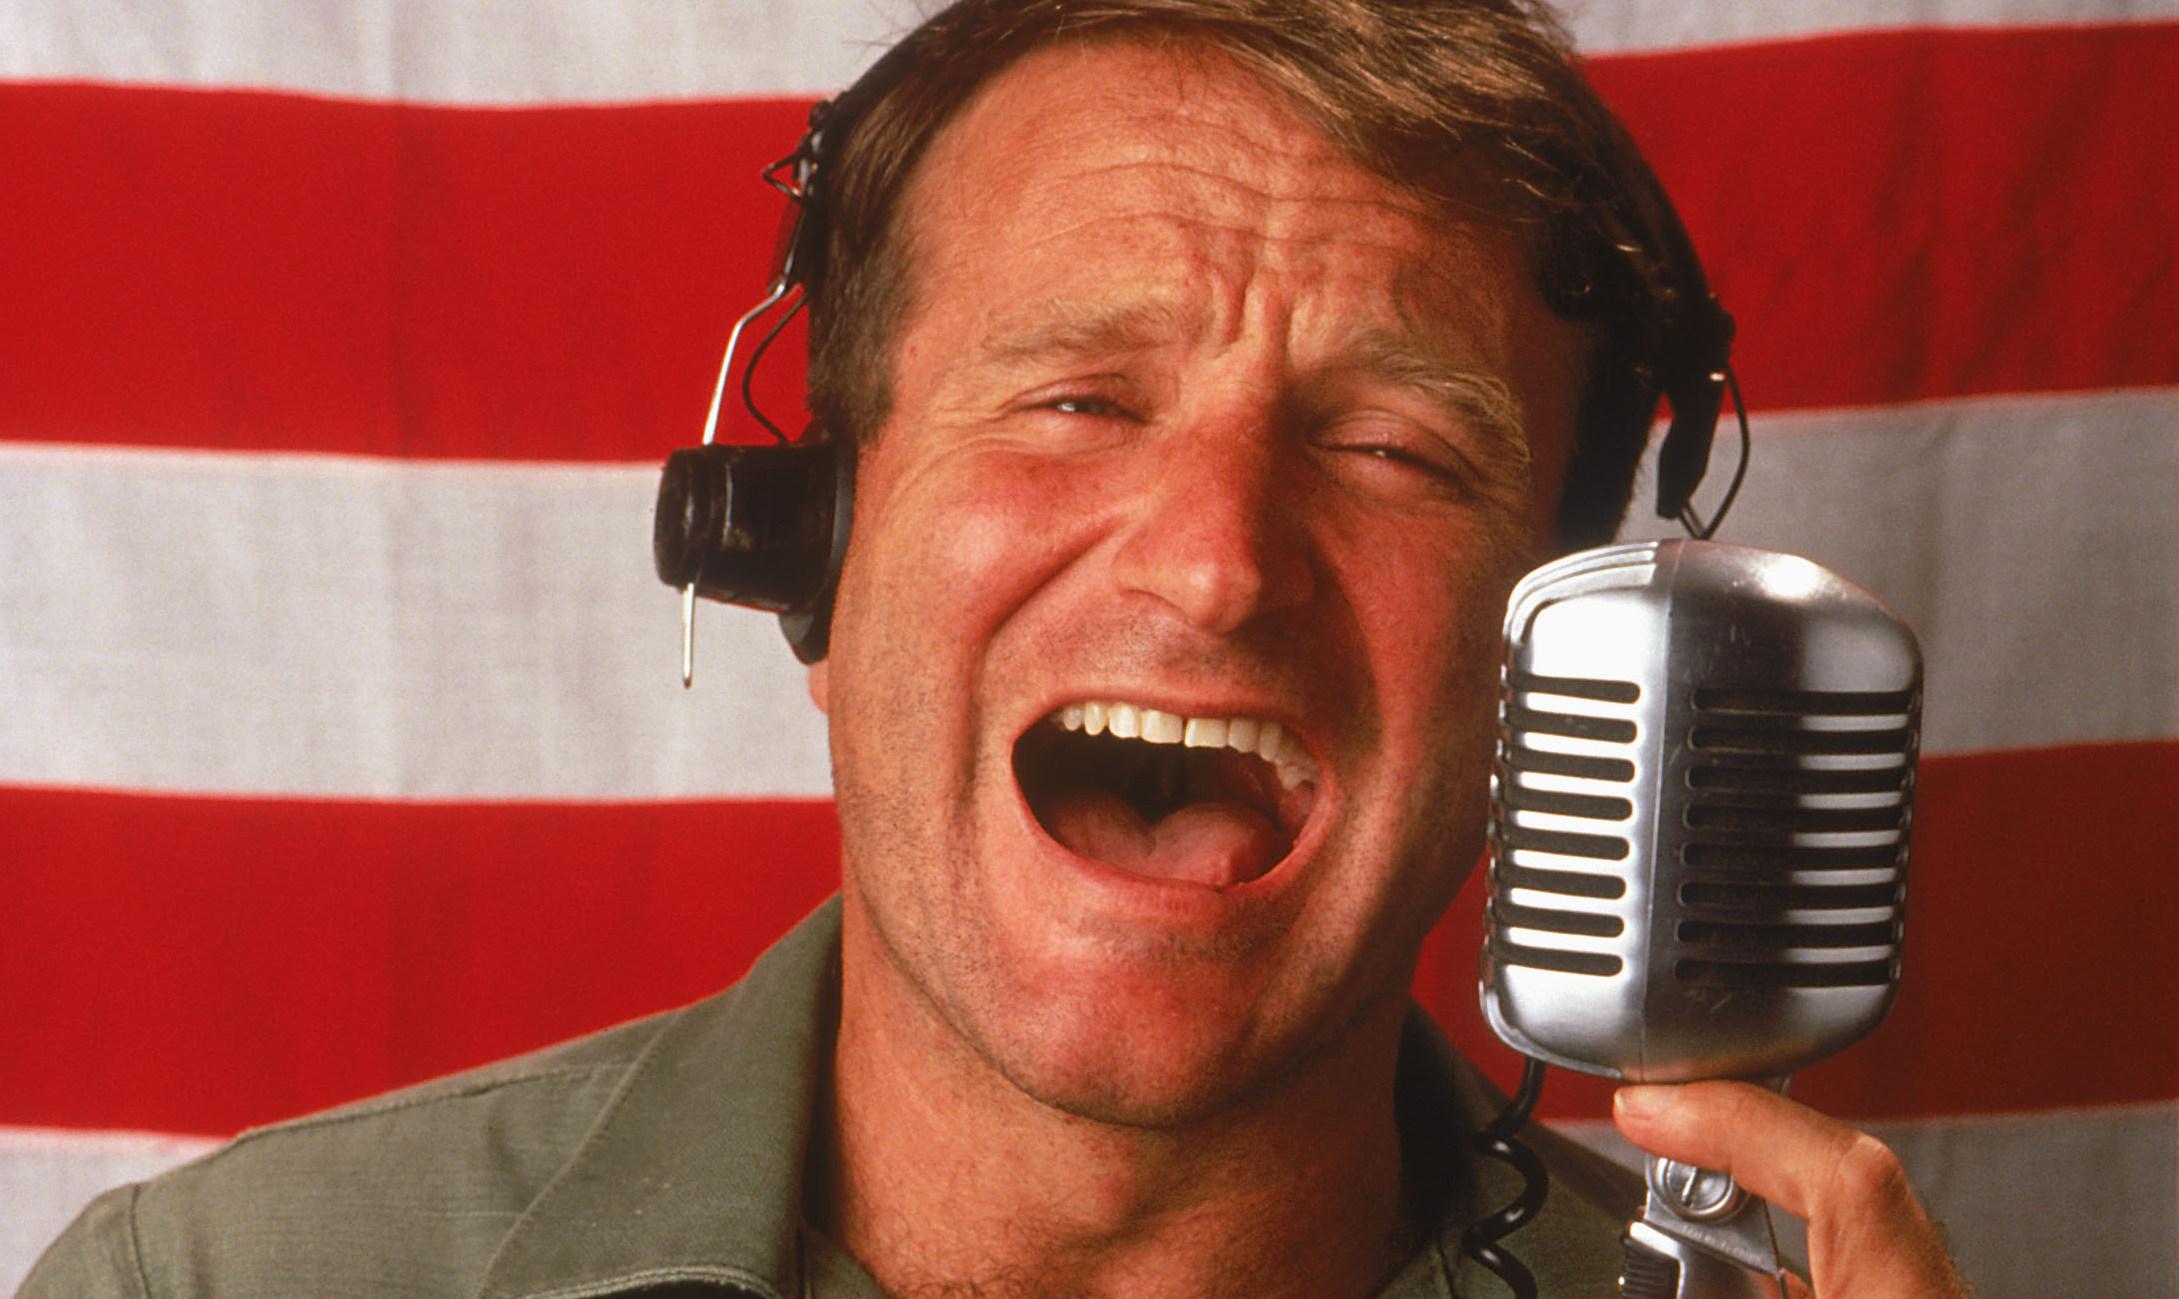 Robin Williams' star-making turn in Good Morning, Vietnam (1987)